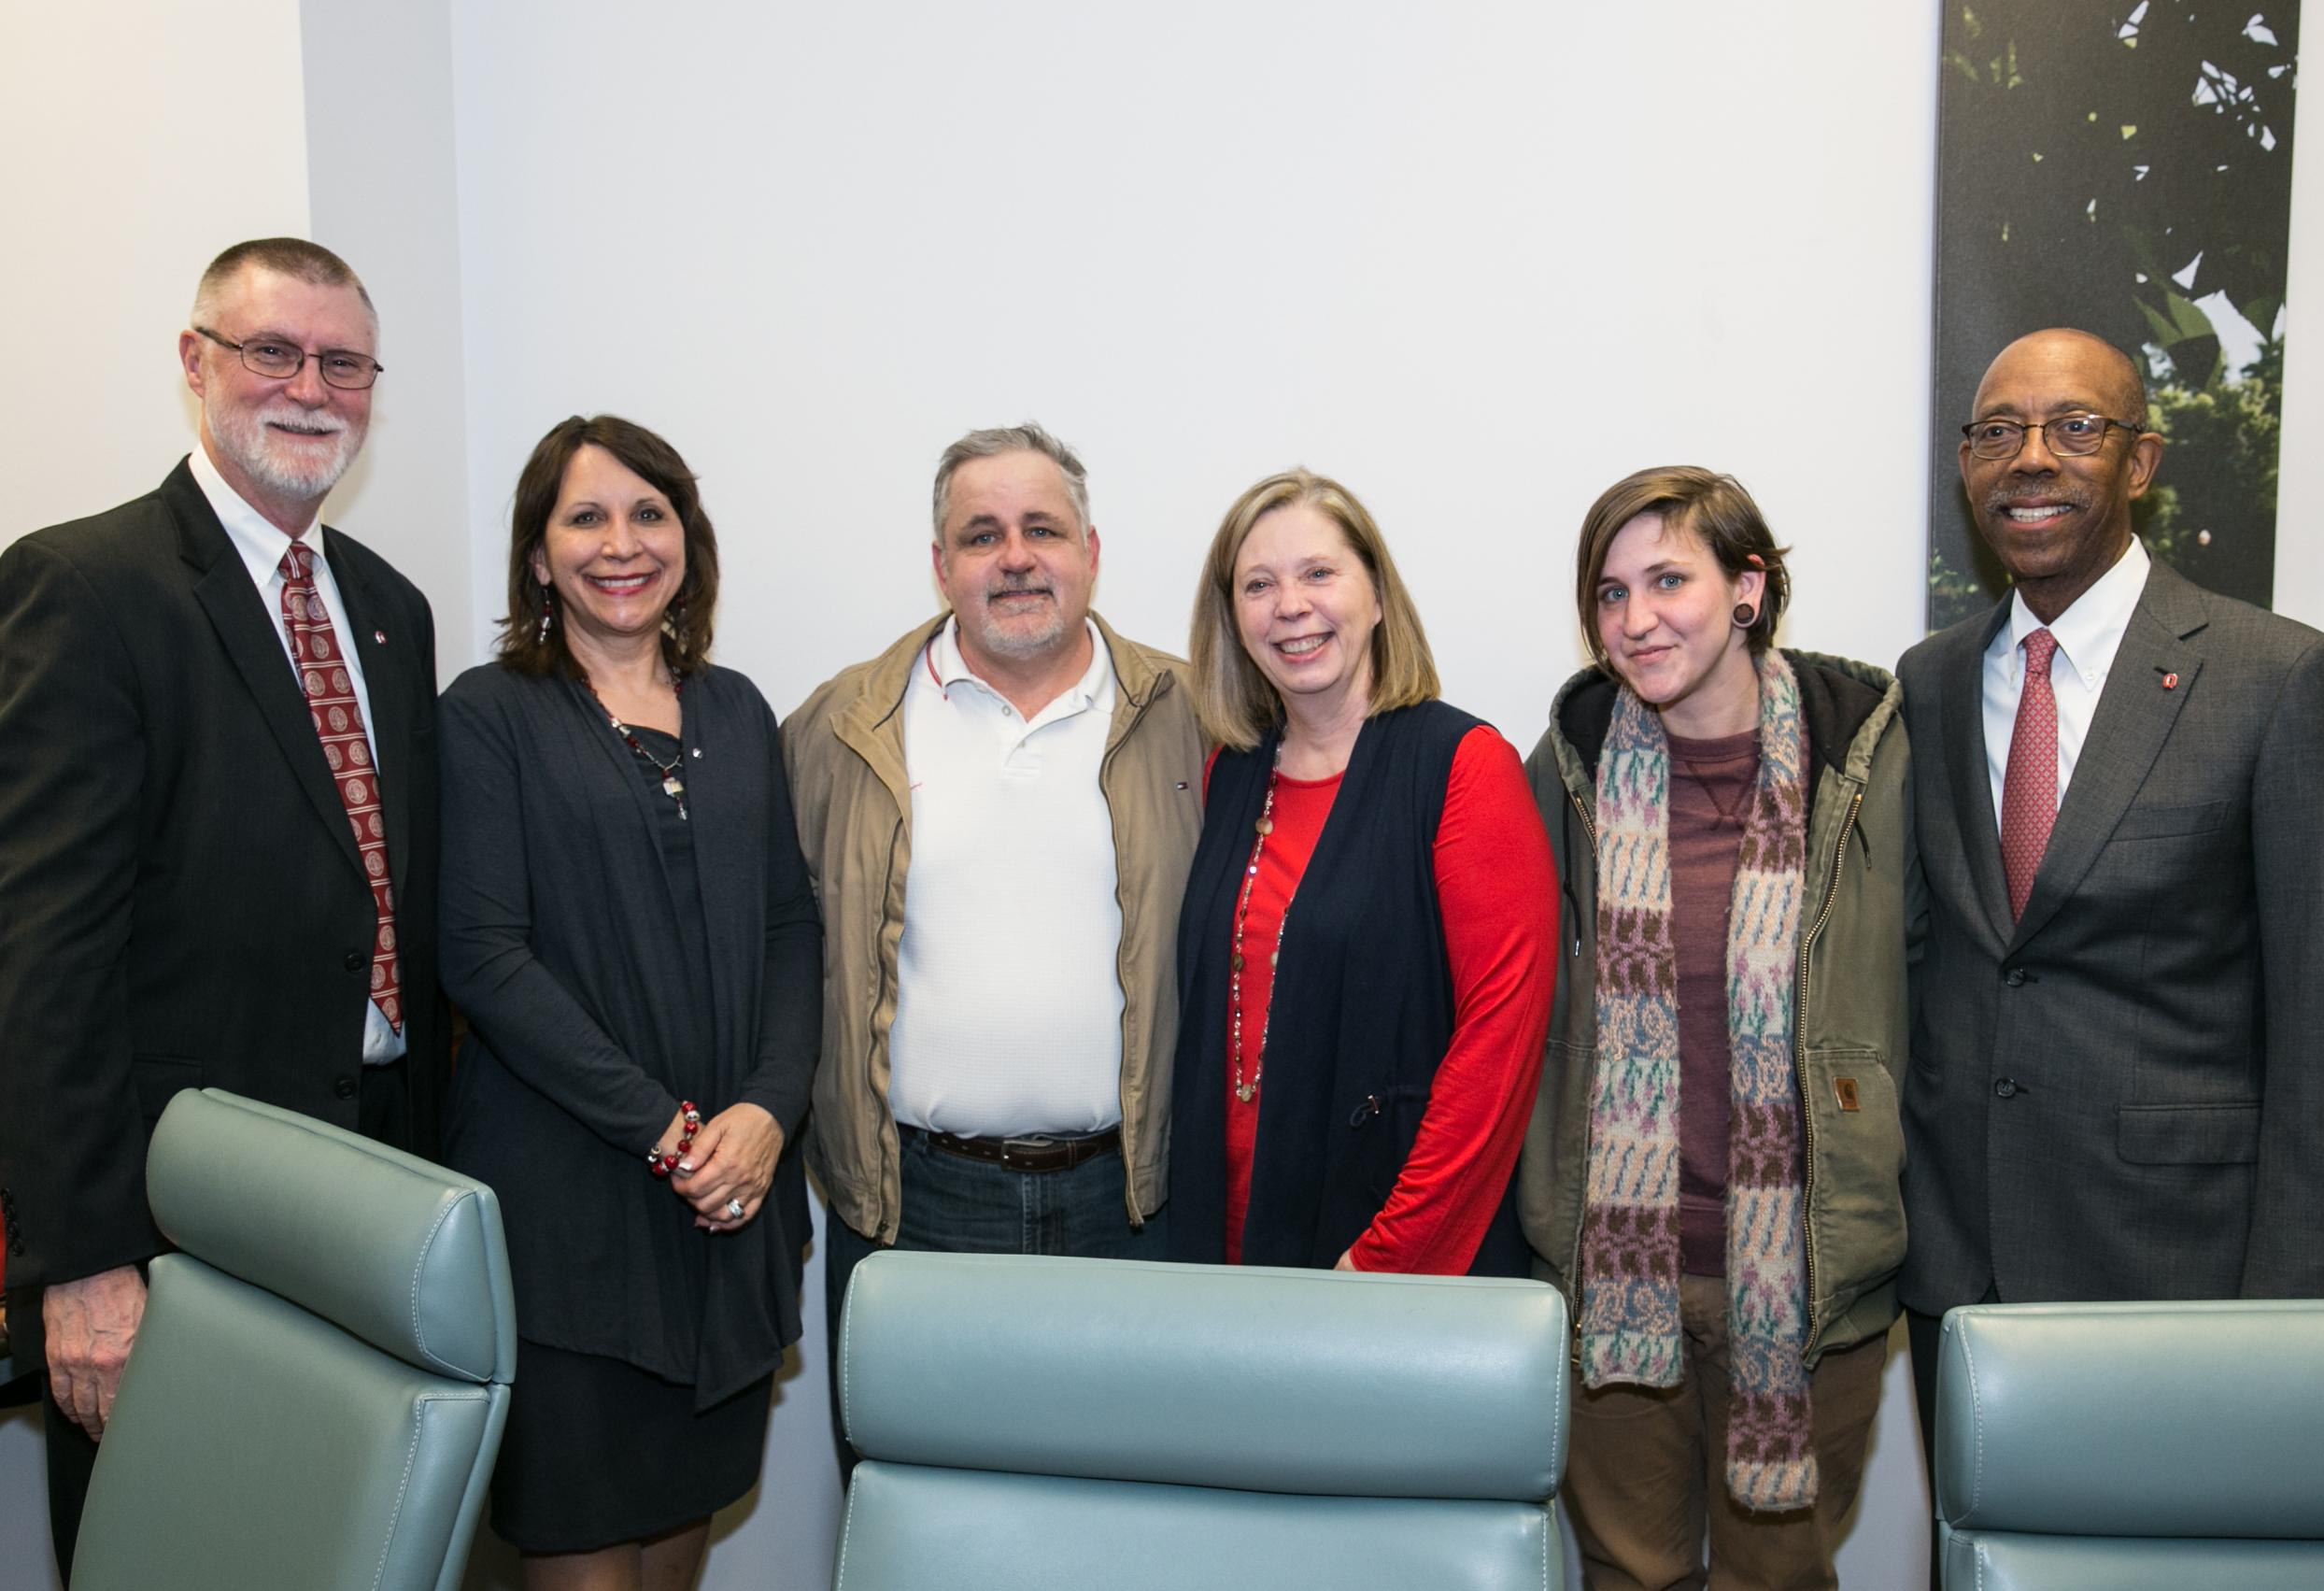 Alice Teall with Dean Bernadette Melnyk, Provost Bruce McPheron, President Michael Drake and family members